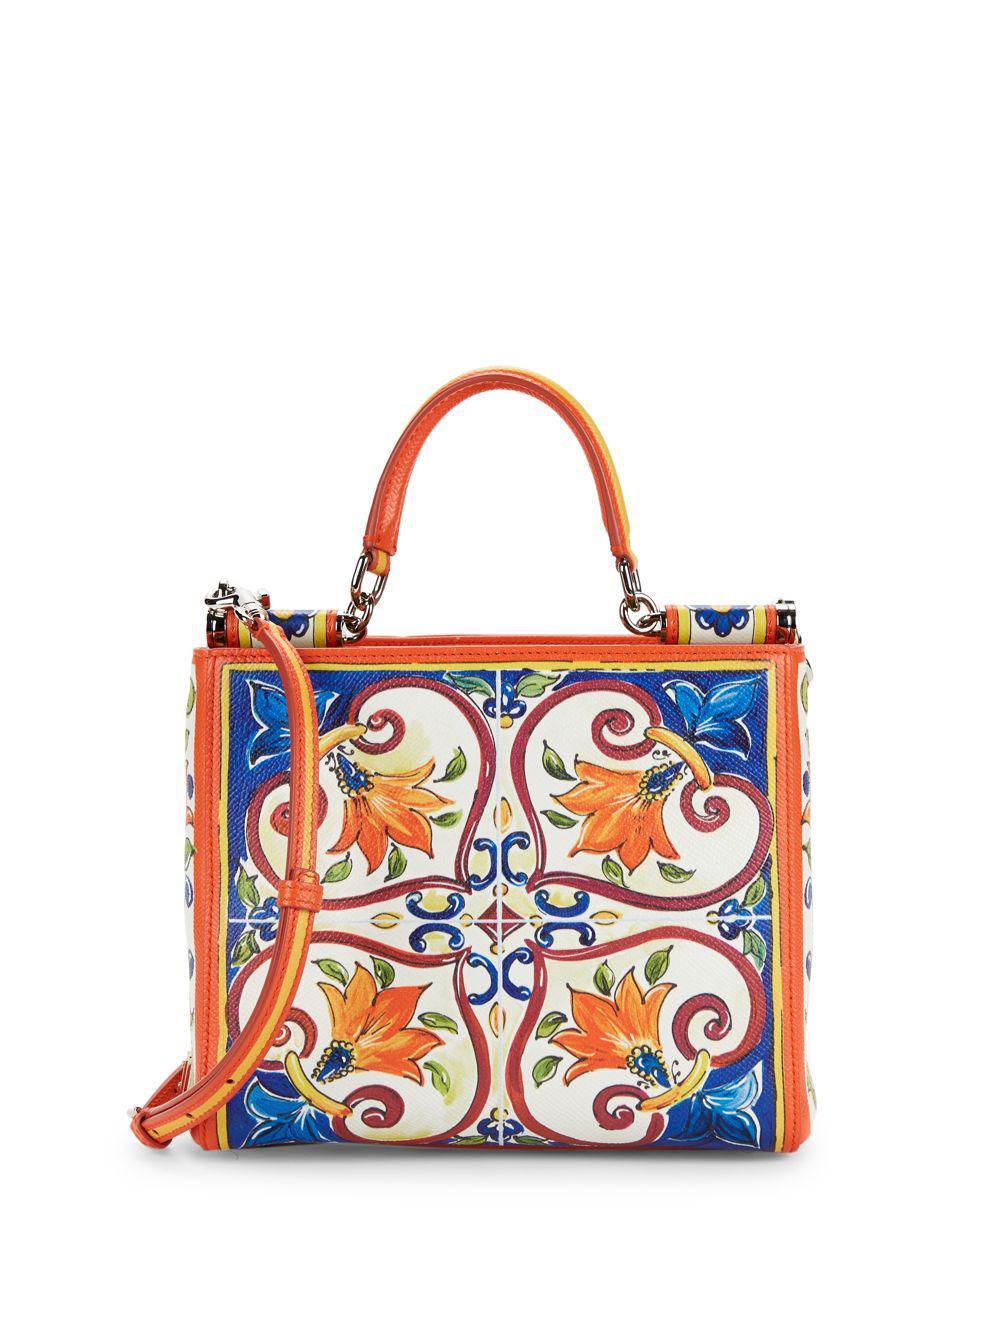 c168acf616 Lyst - Dolce   Gabbana Mini Leather Crossbody Bag